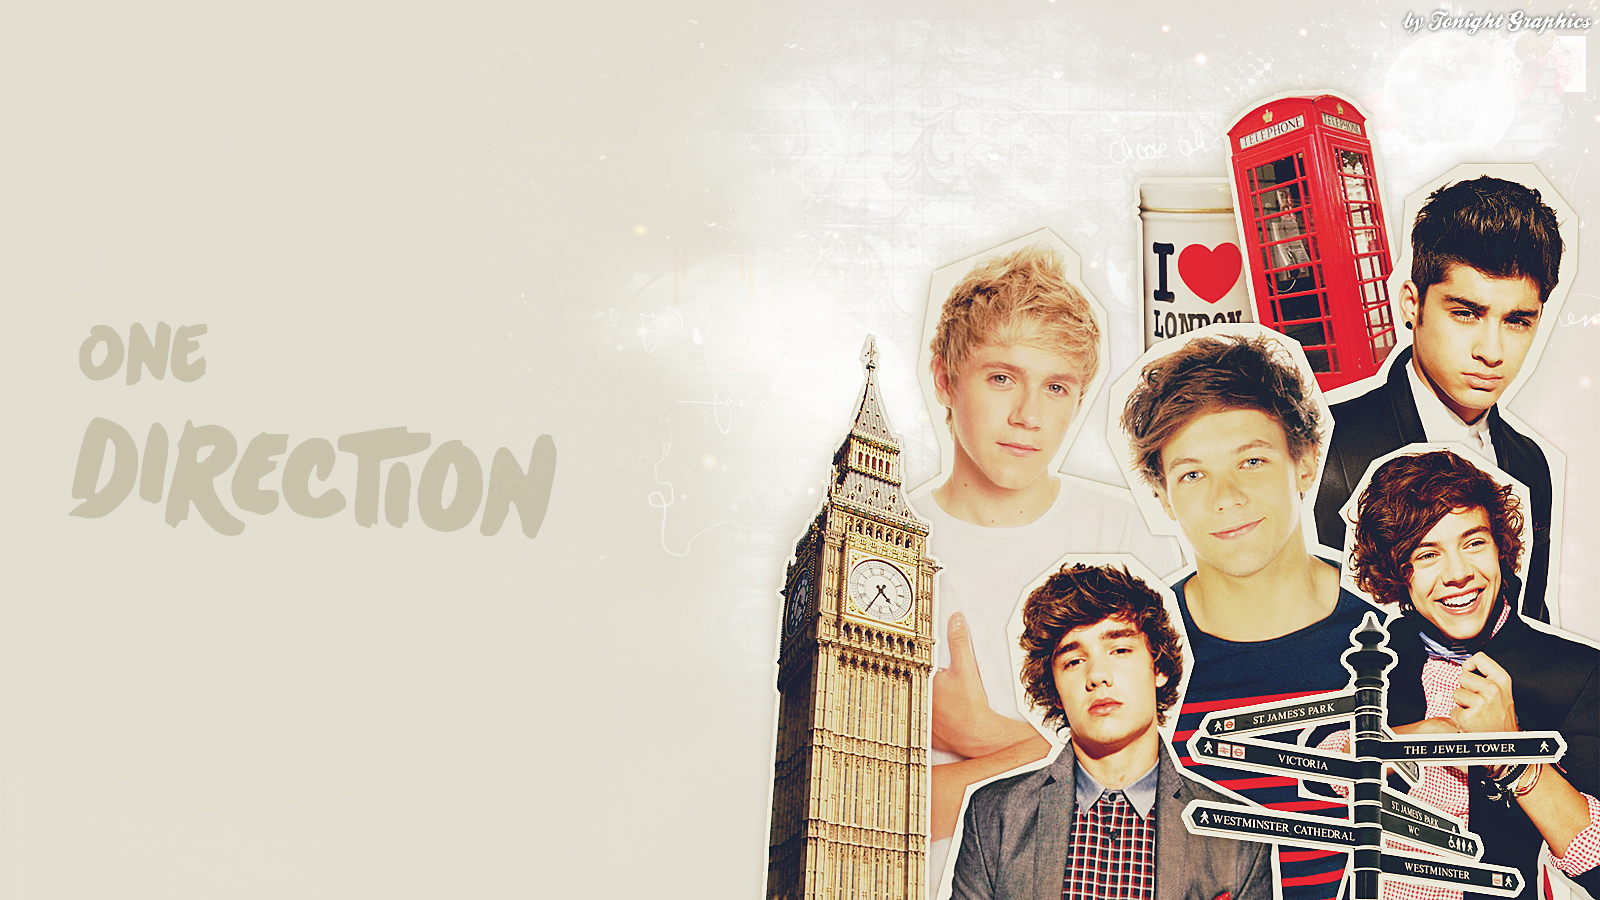 Mashababko: Wallpaper Iphone One Direction